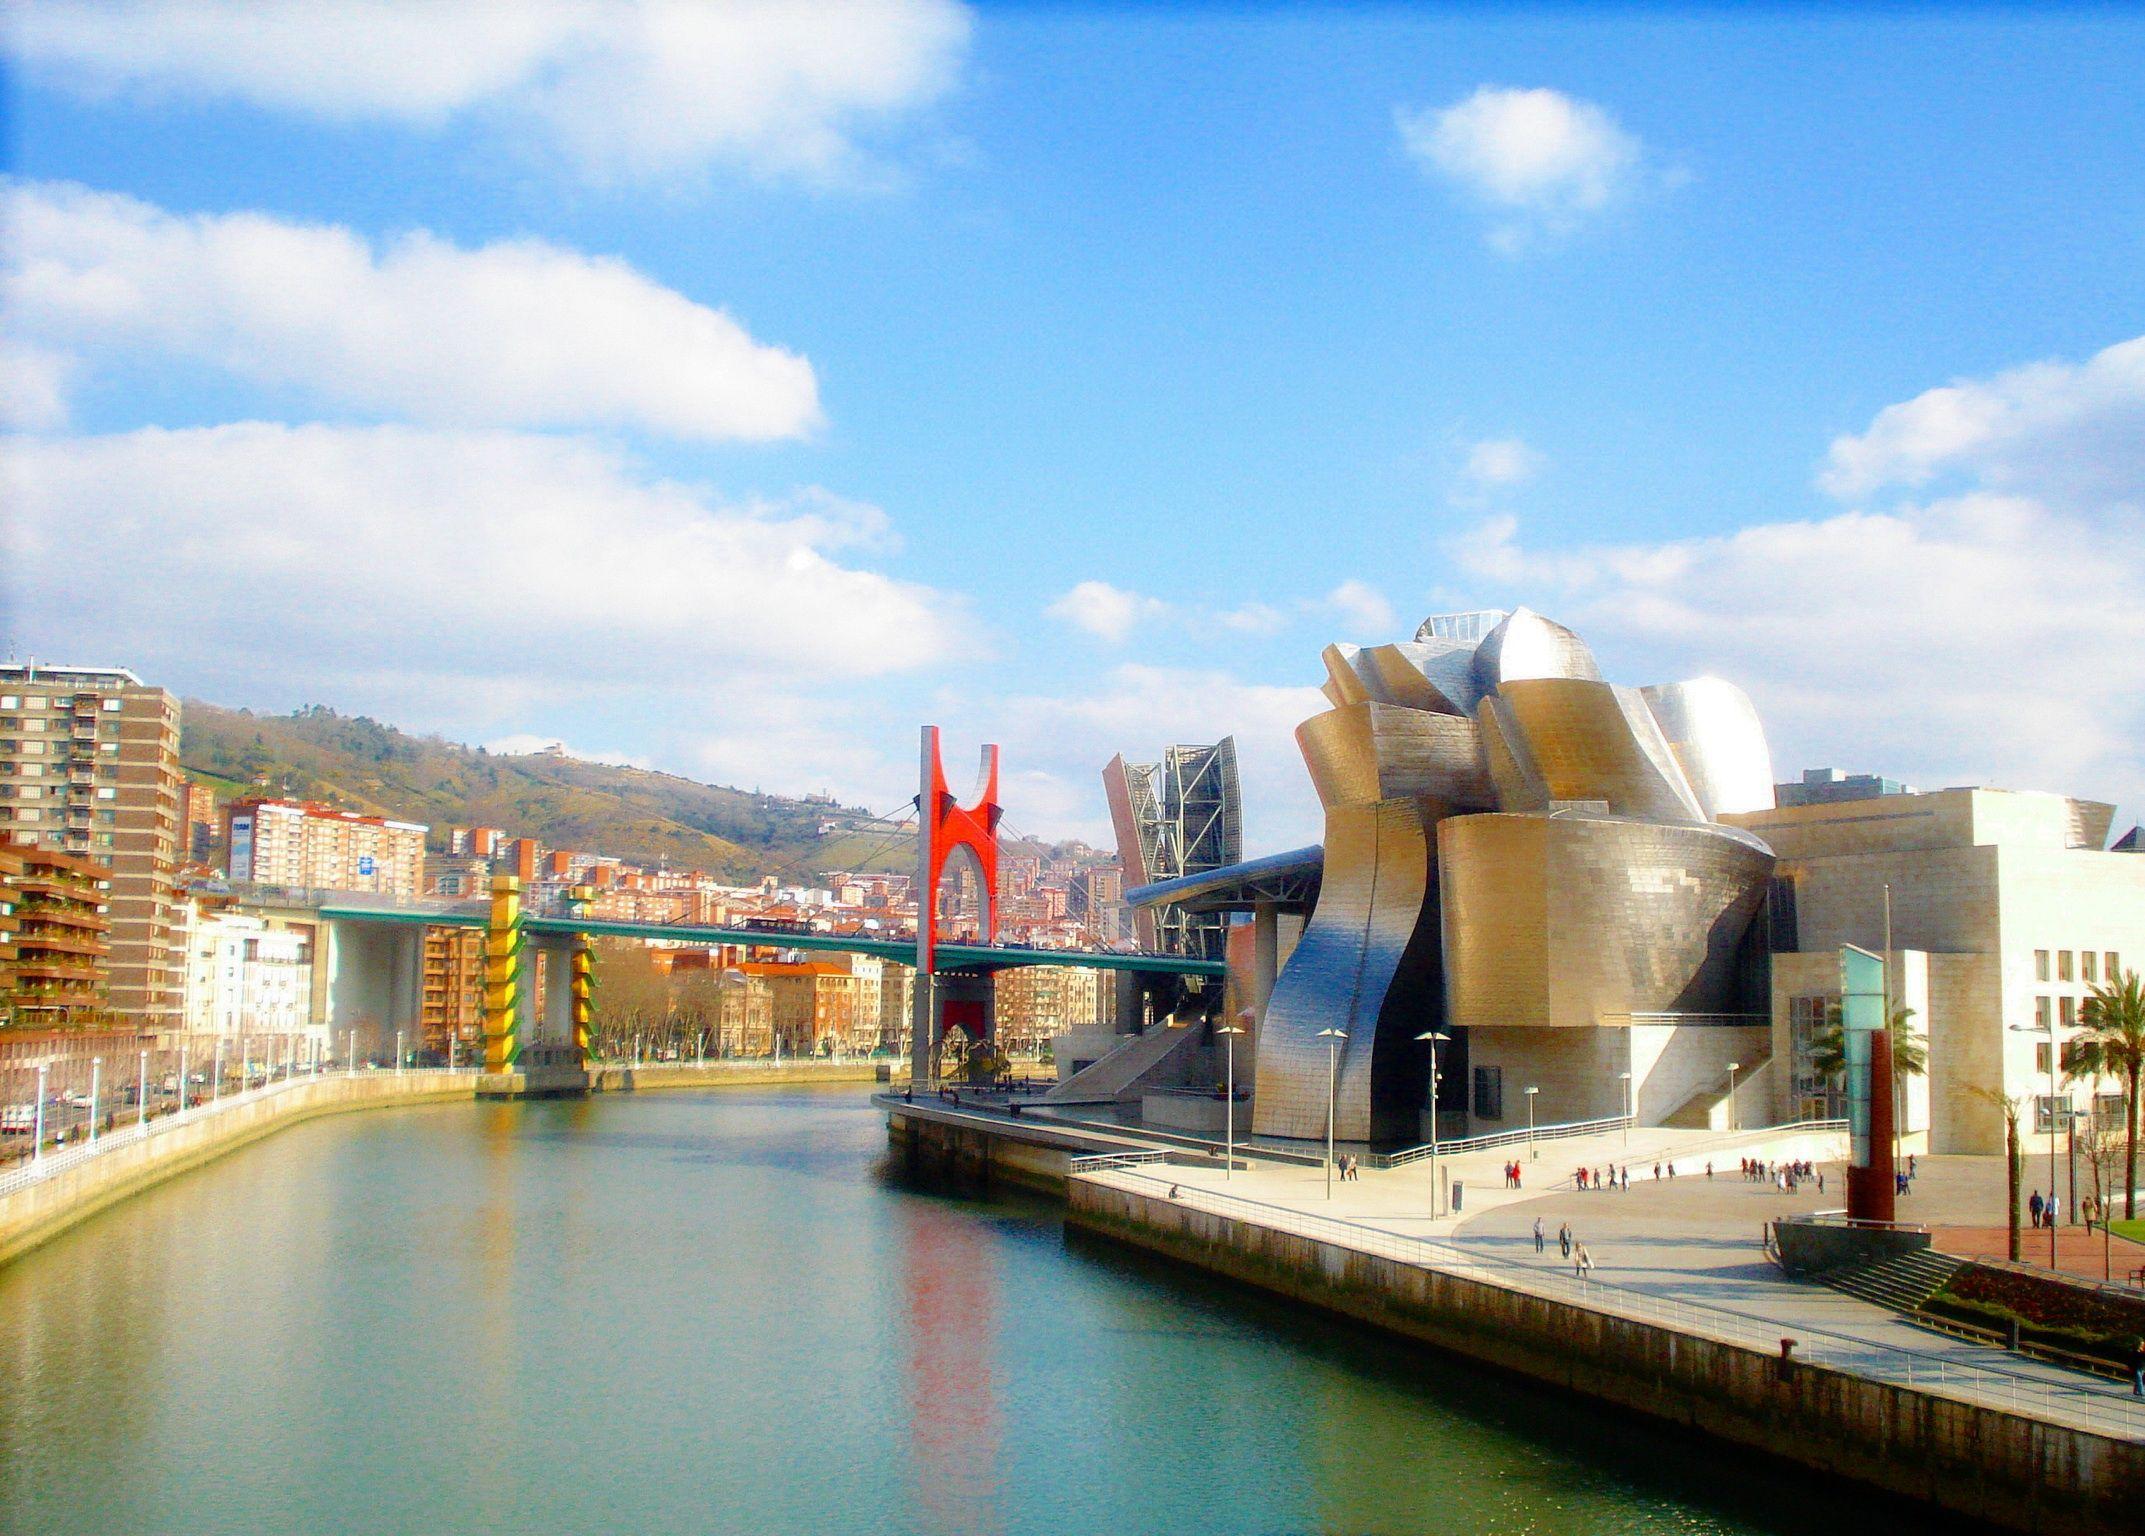 Bilbao (Bilbo), Spain Museum Guggenheim País Vasco - Euskadi